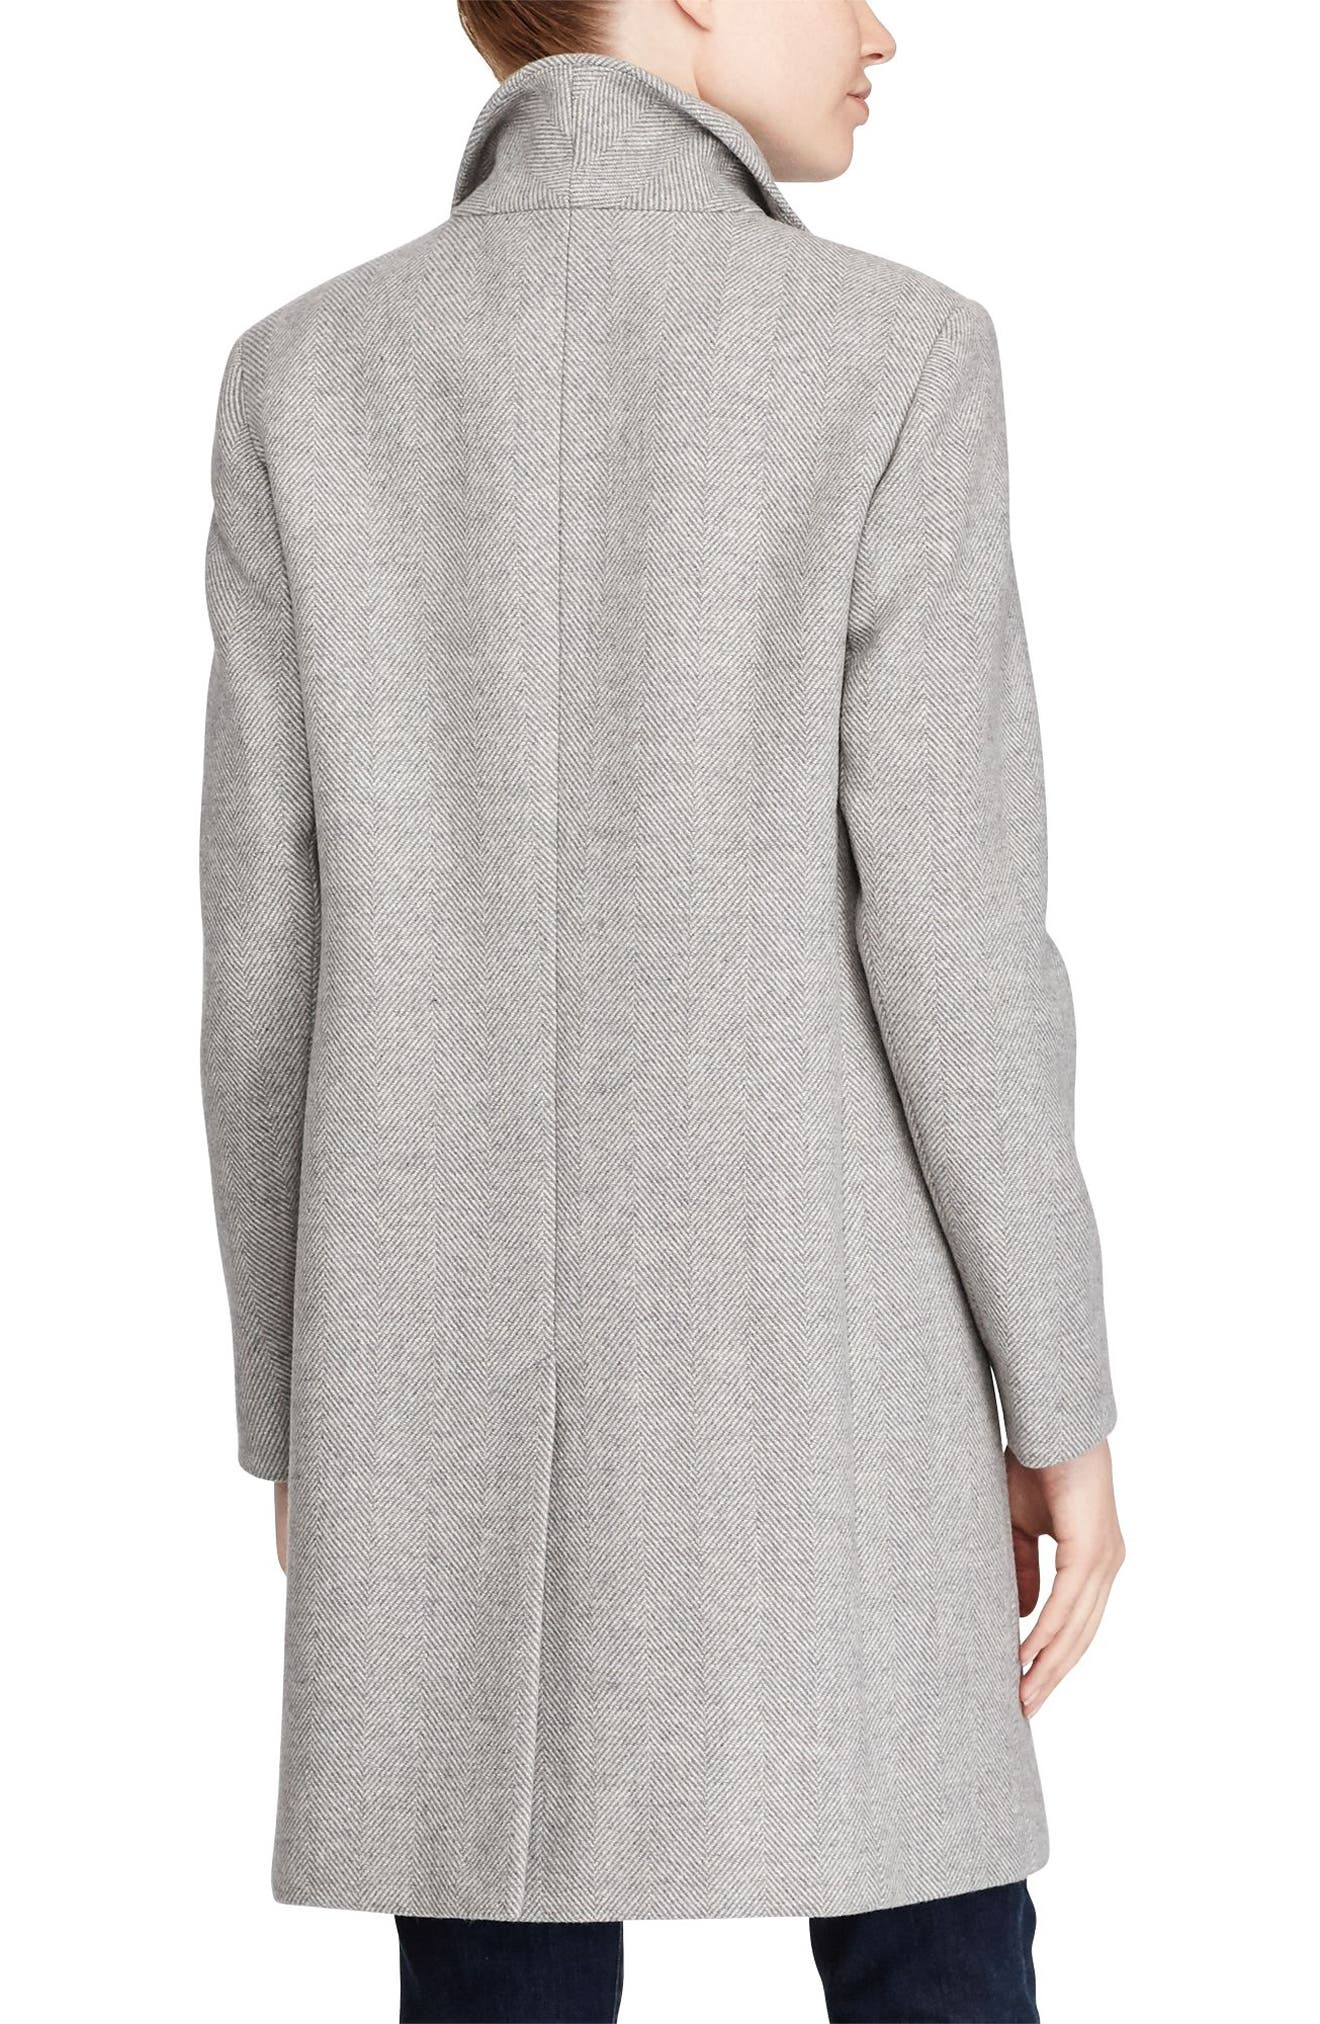 Wool Blend Reefer Coat,                             Alternate thumbnail 31, color,